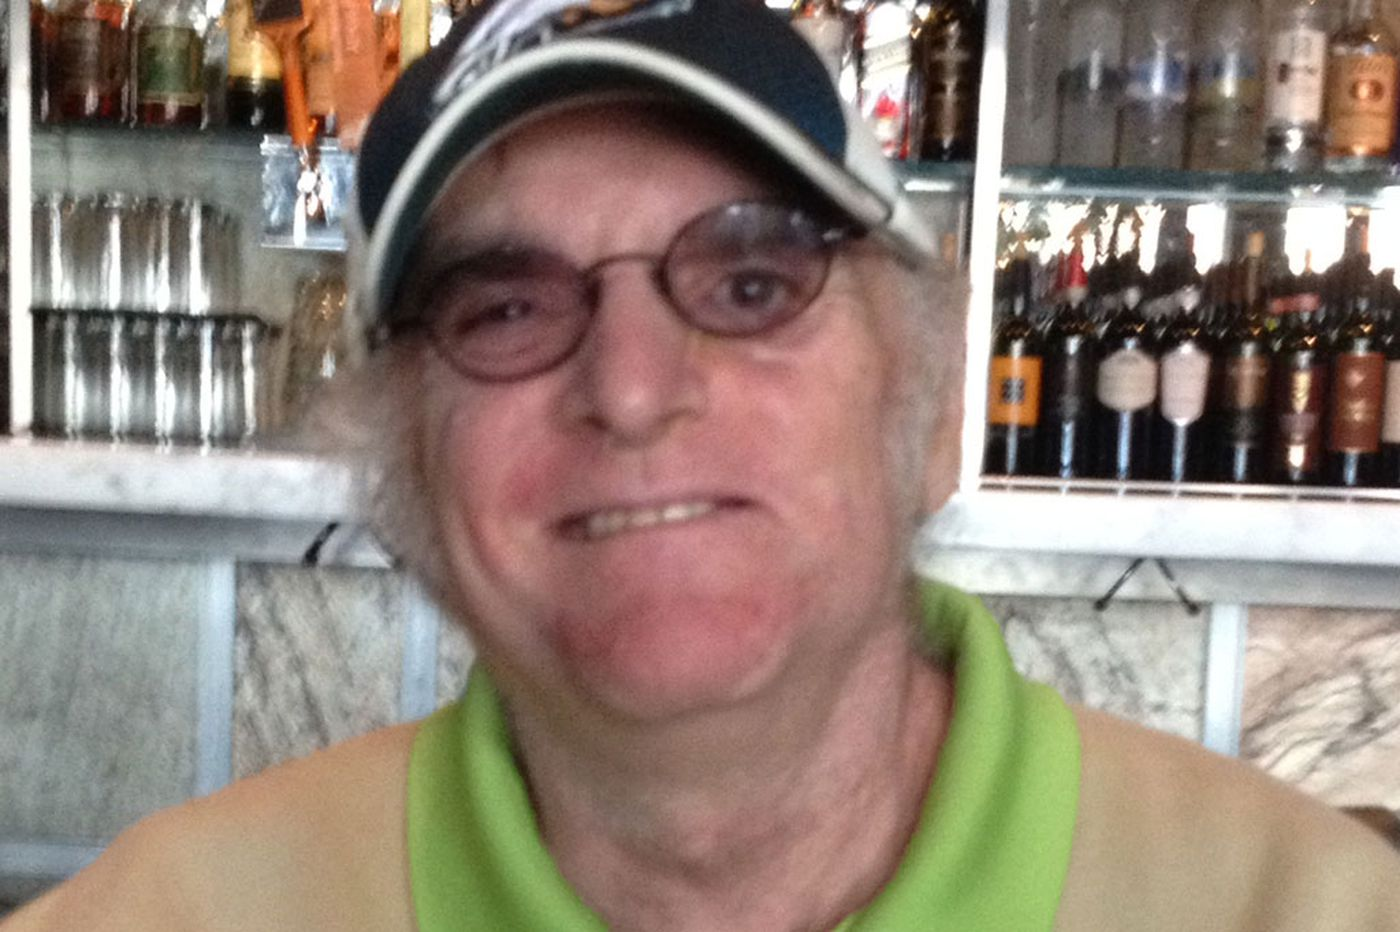 'Cool Runnings' cowriter Michael Goldberg, 55